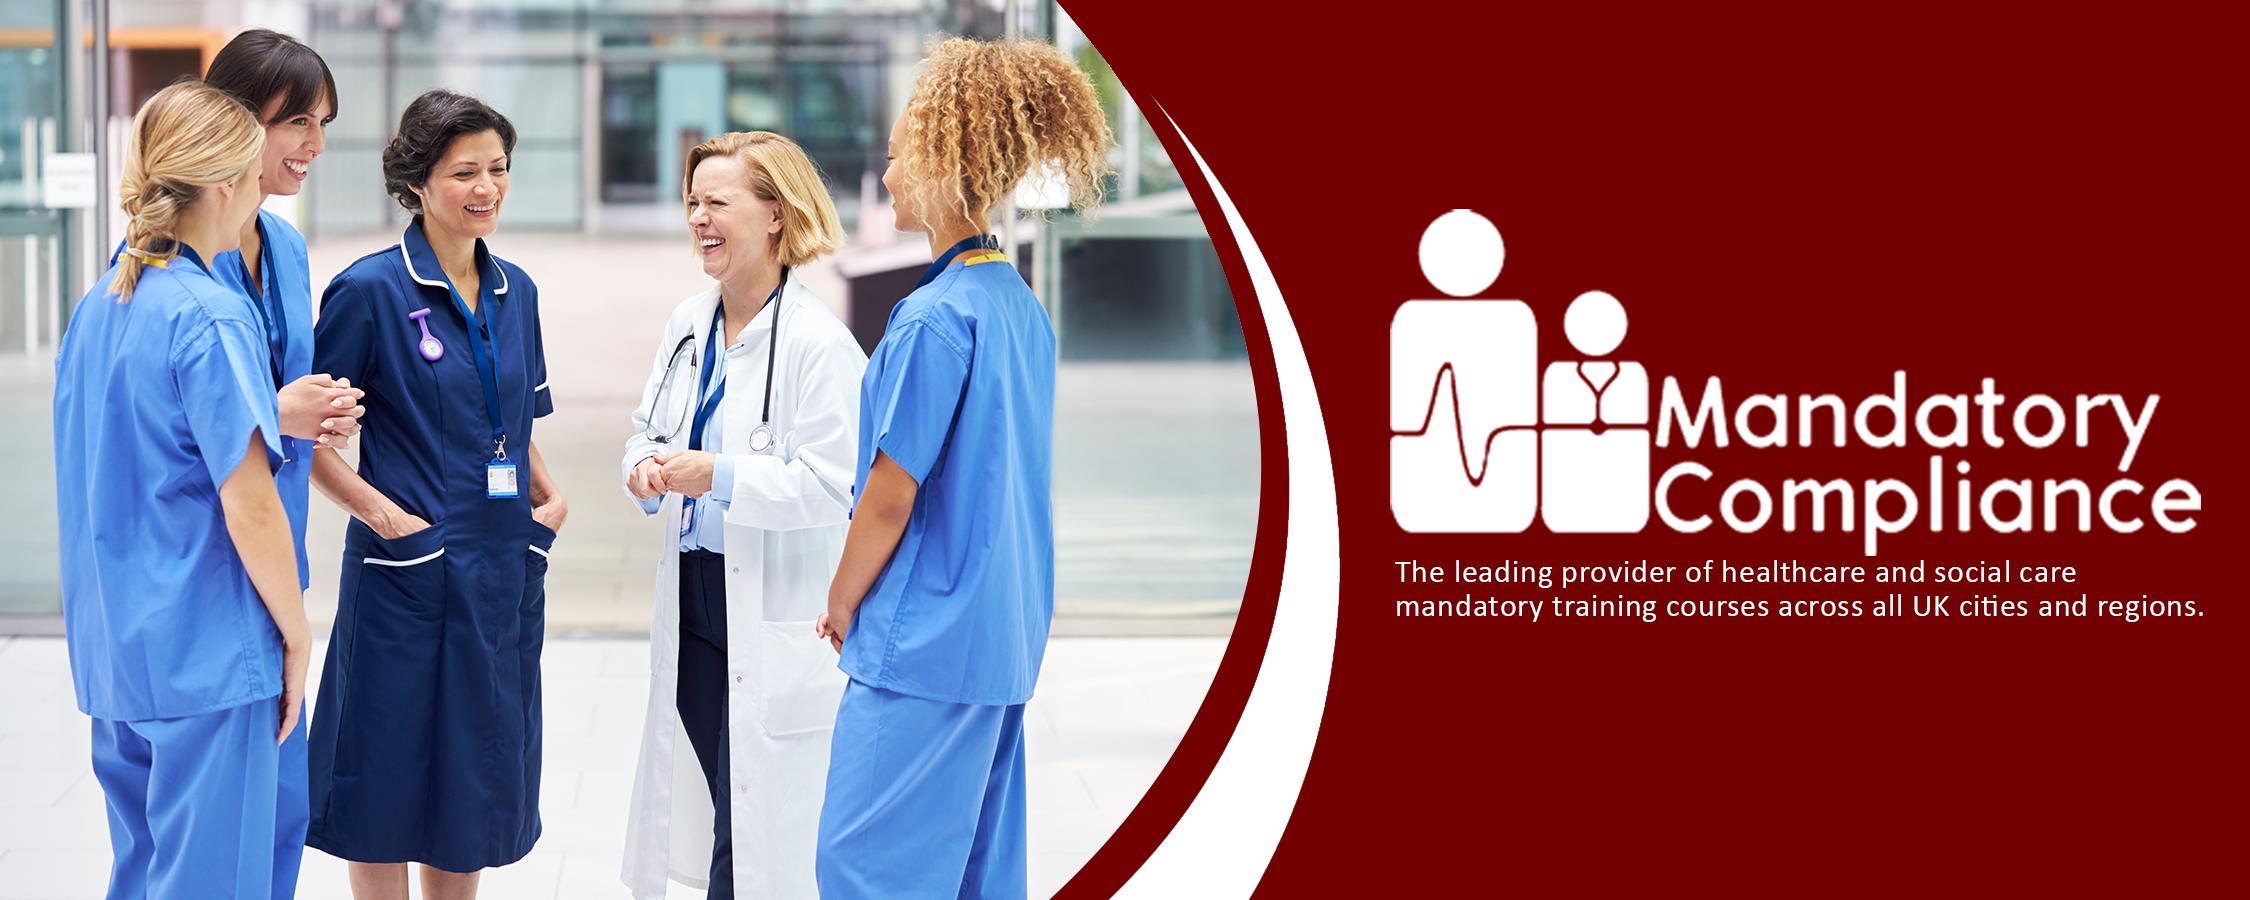 Care Certificate Standard 6 – Communication - E-Learning Courses - Mandatory Compliance UK -